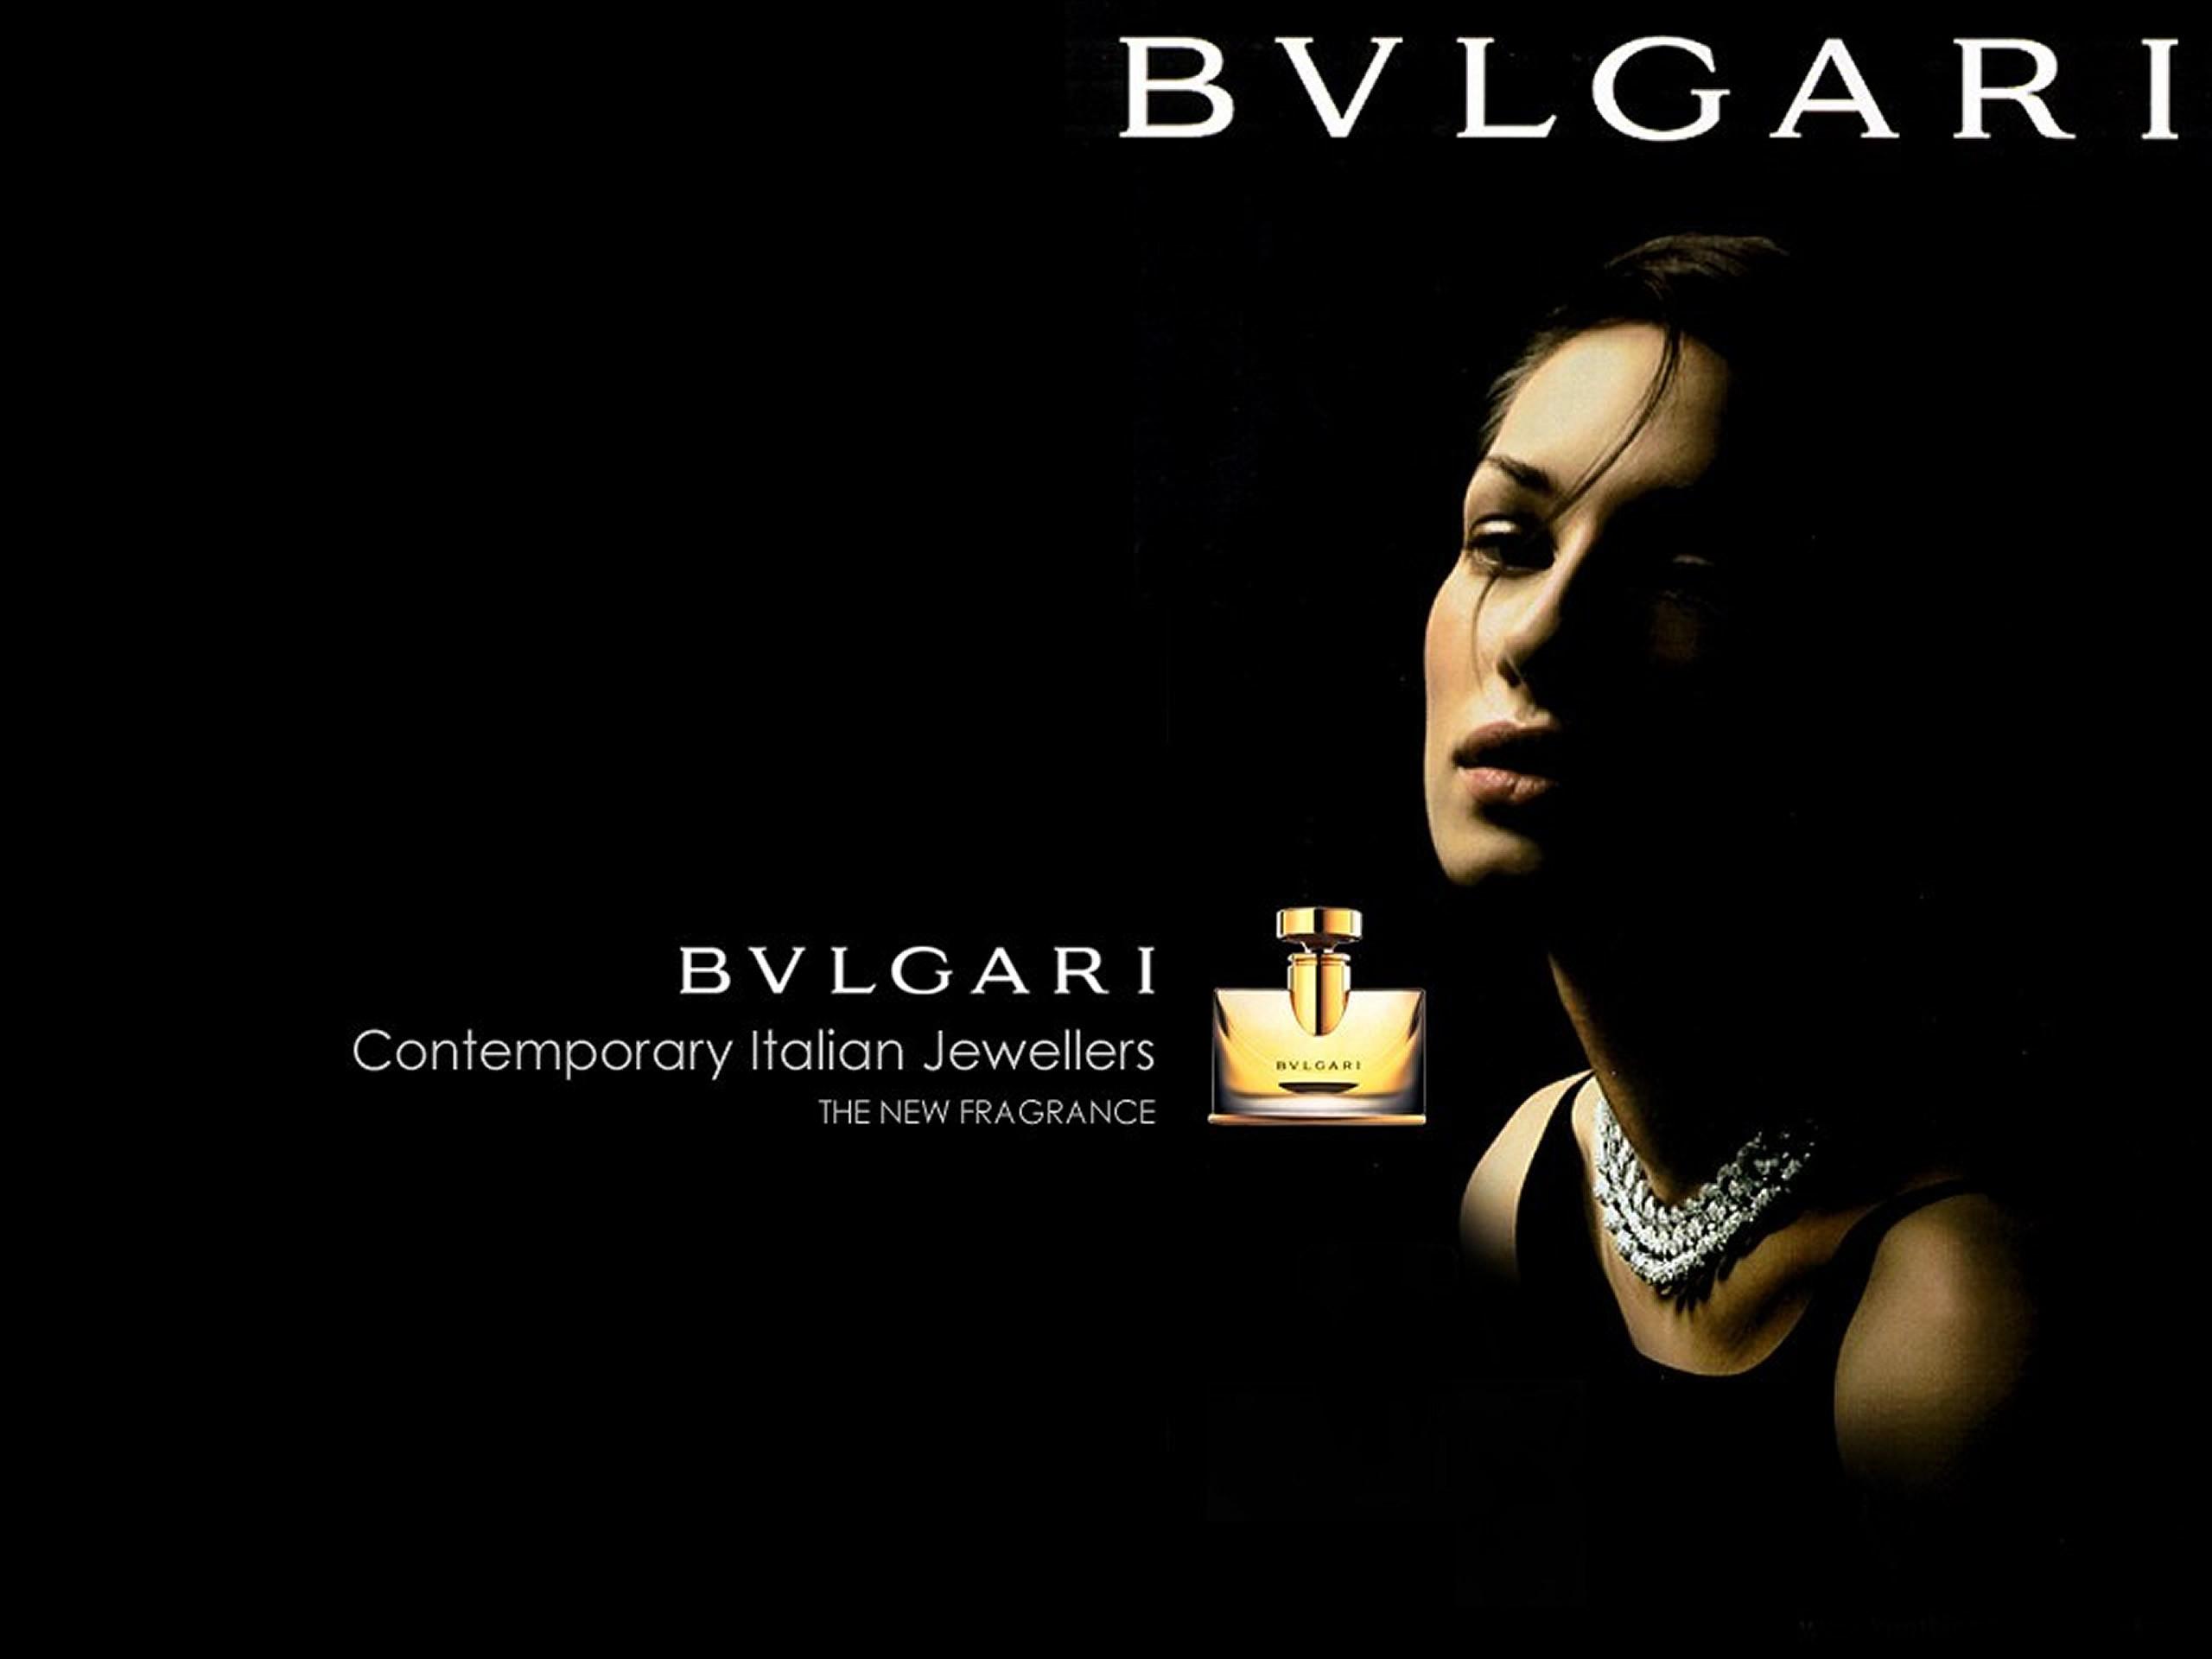 Bvlgari Bulgari Perfume for Women Fashion HD Desktop Wallpapers Computer